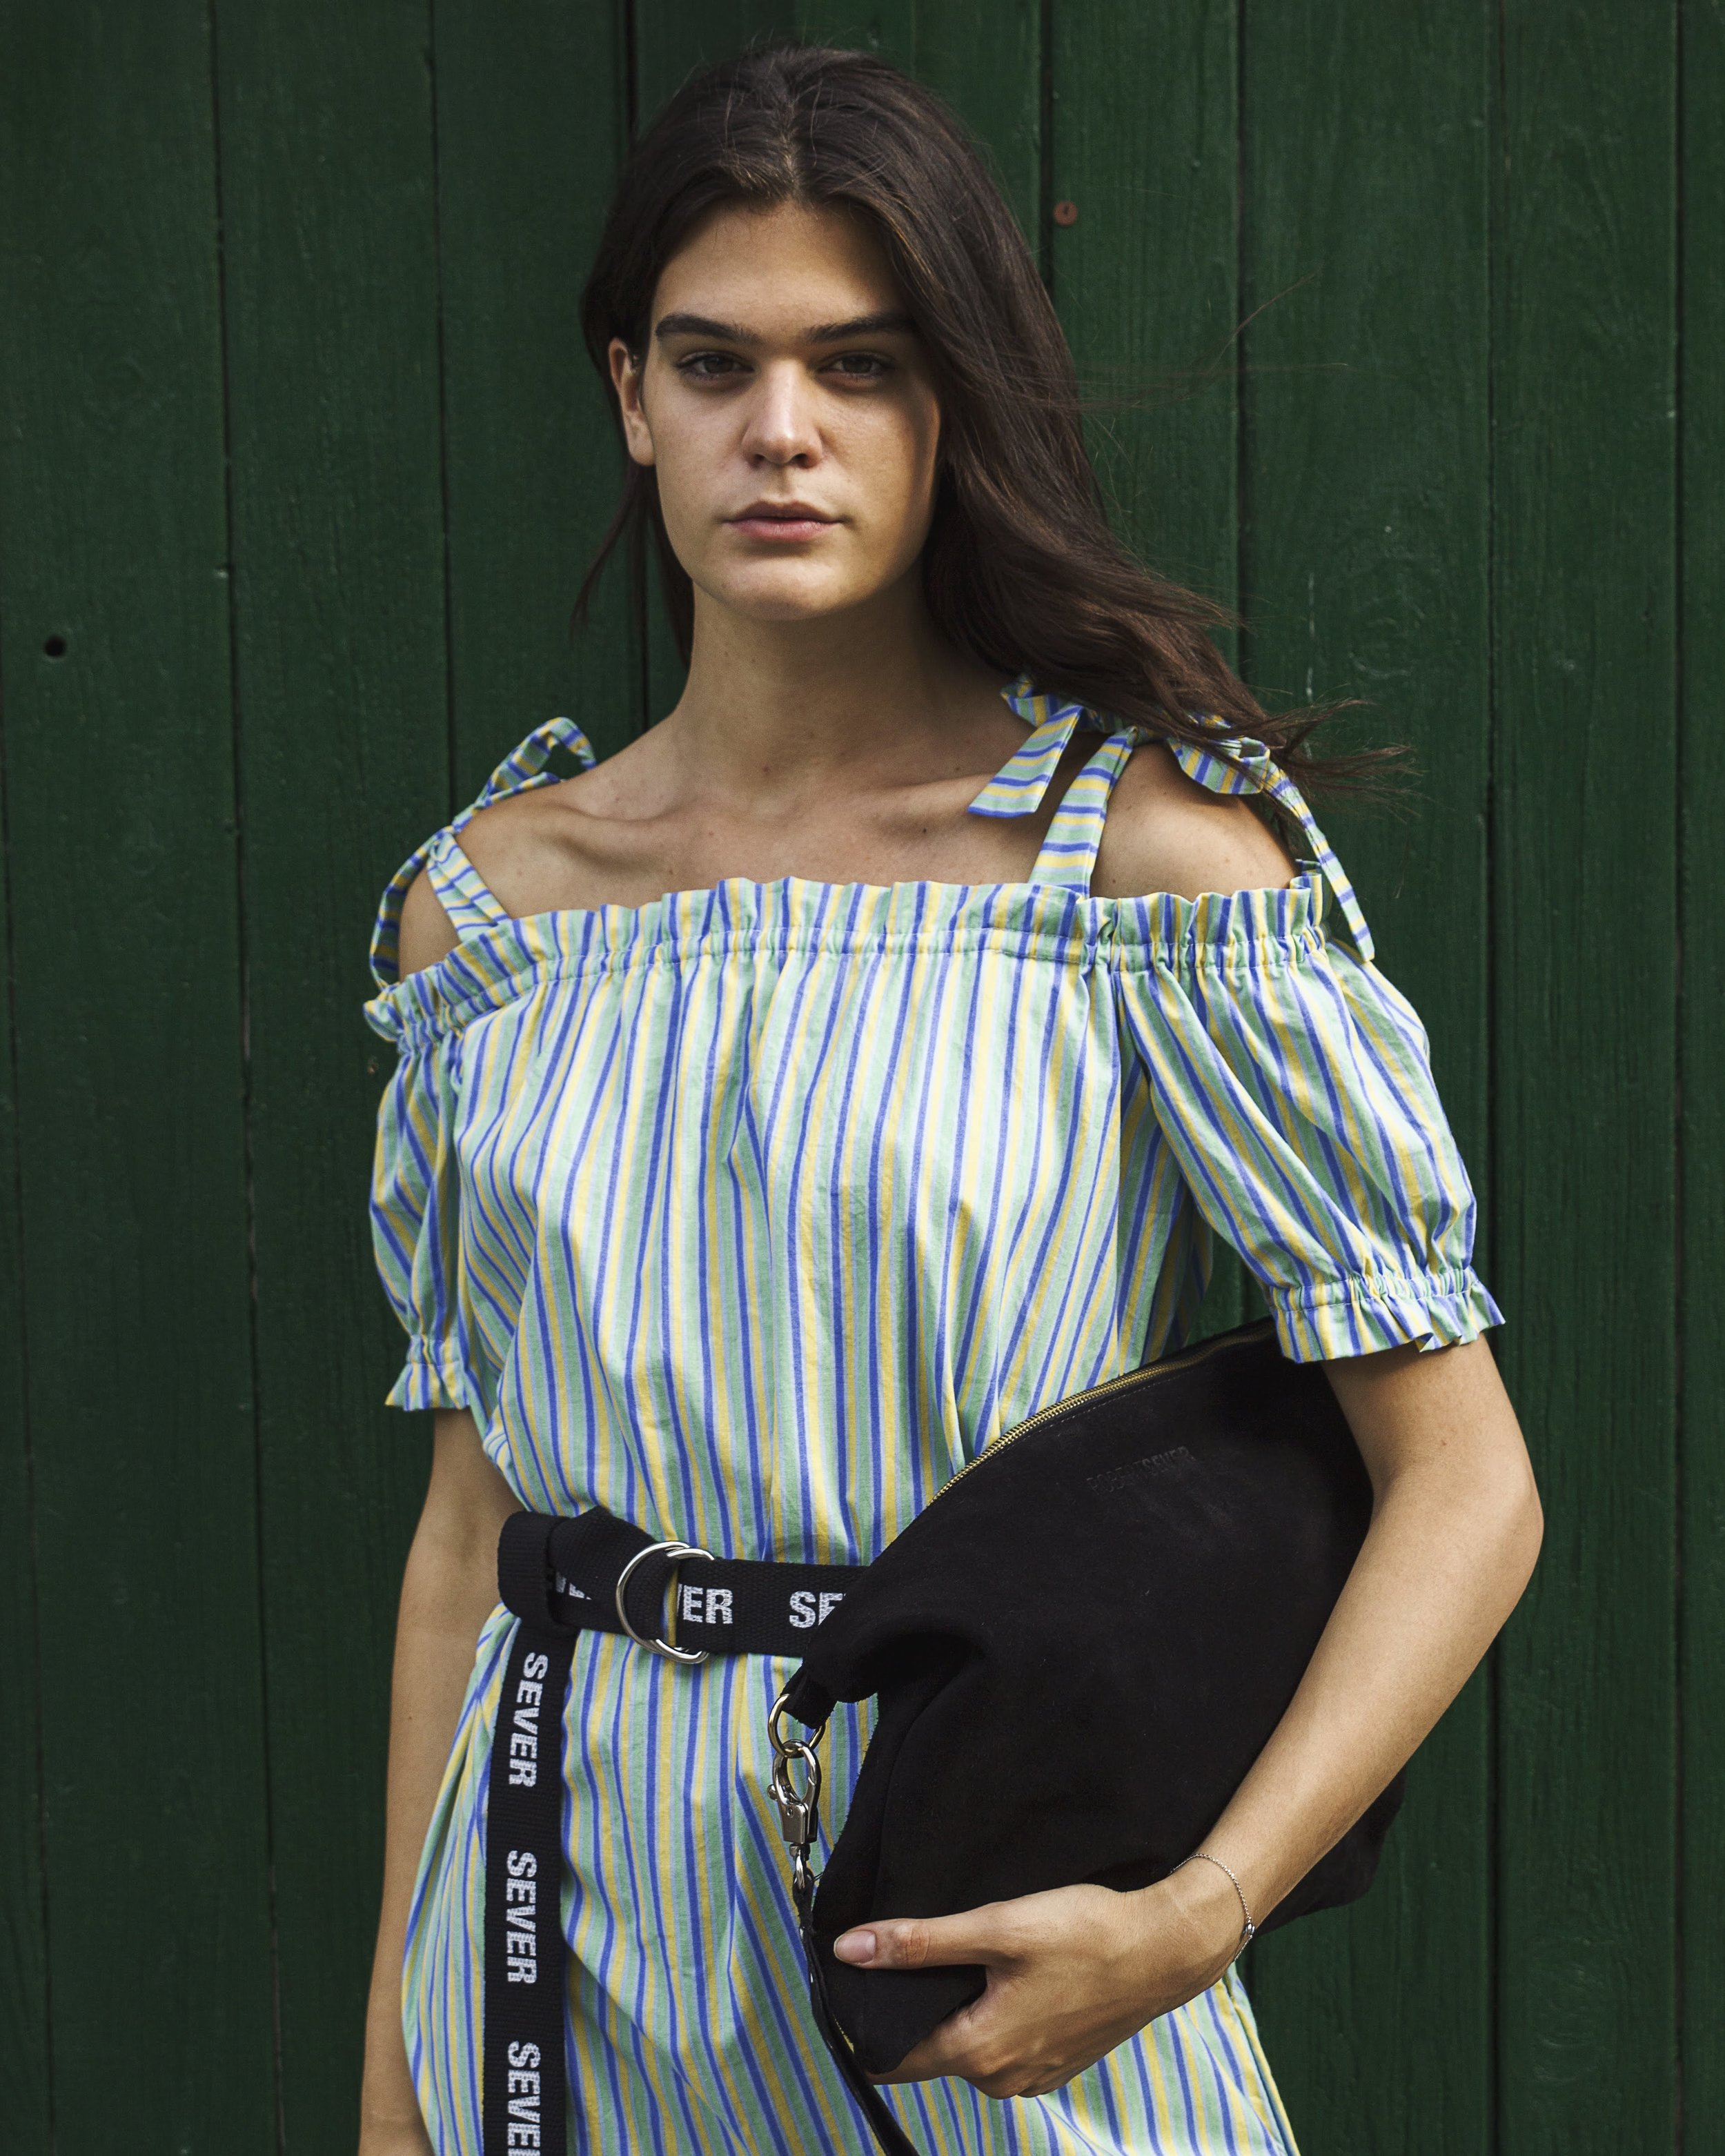 luka-lajic-fashion-photography-robert-sever-dizajner (11).jpg